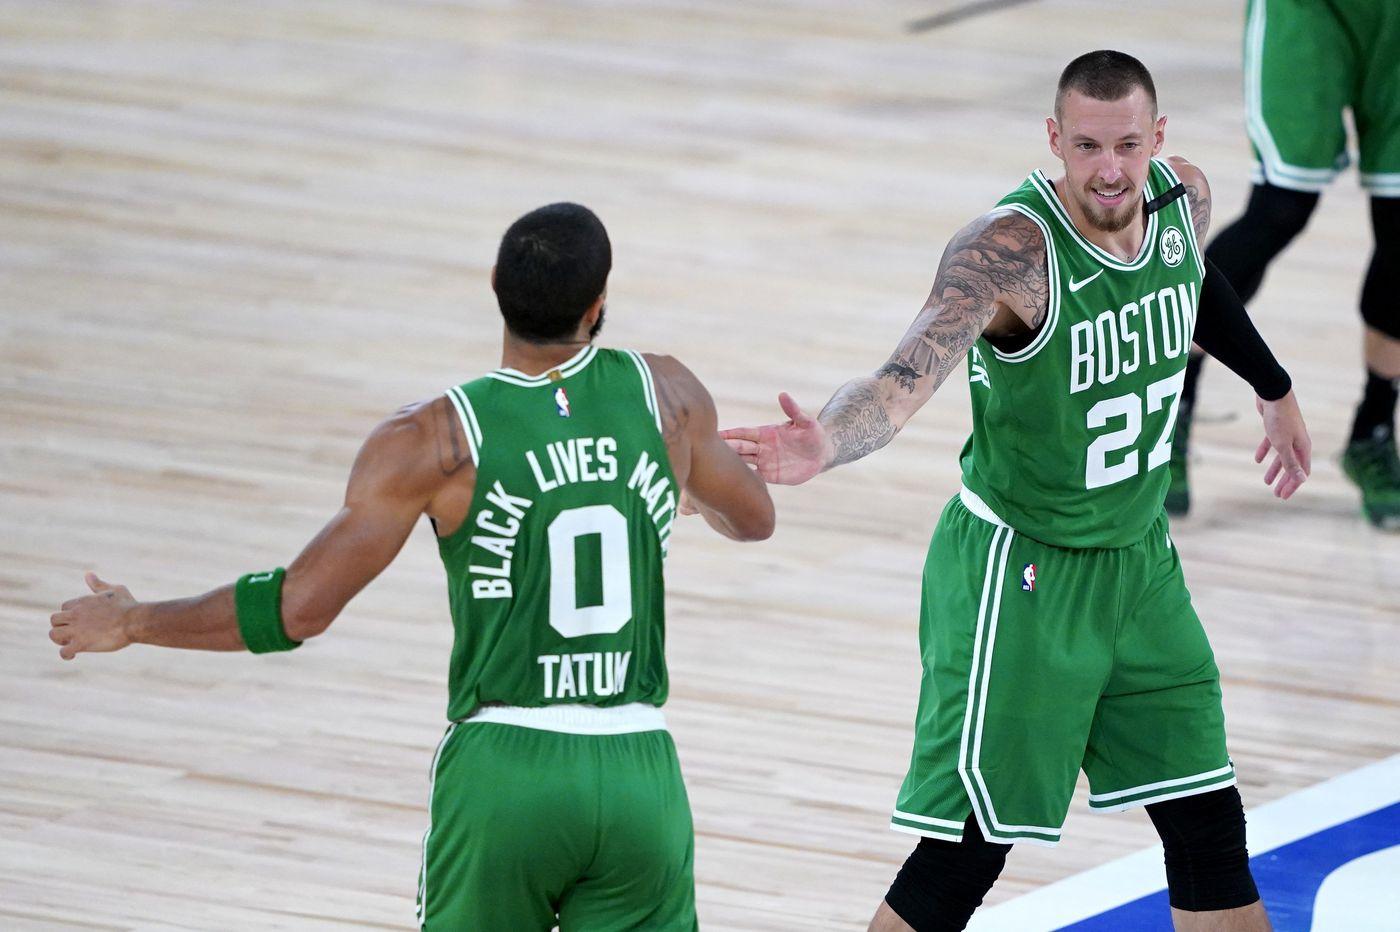 Sixers start playoff series with Boston Celtics at 6:30 p.m. Monday.